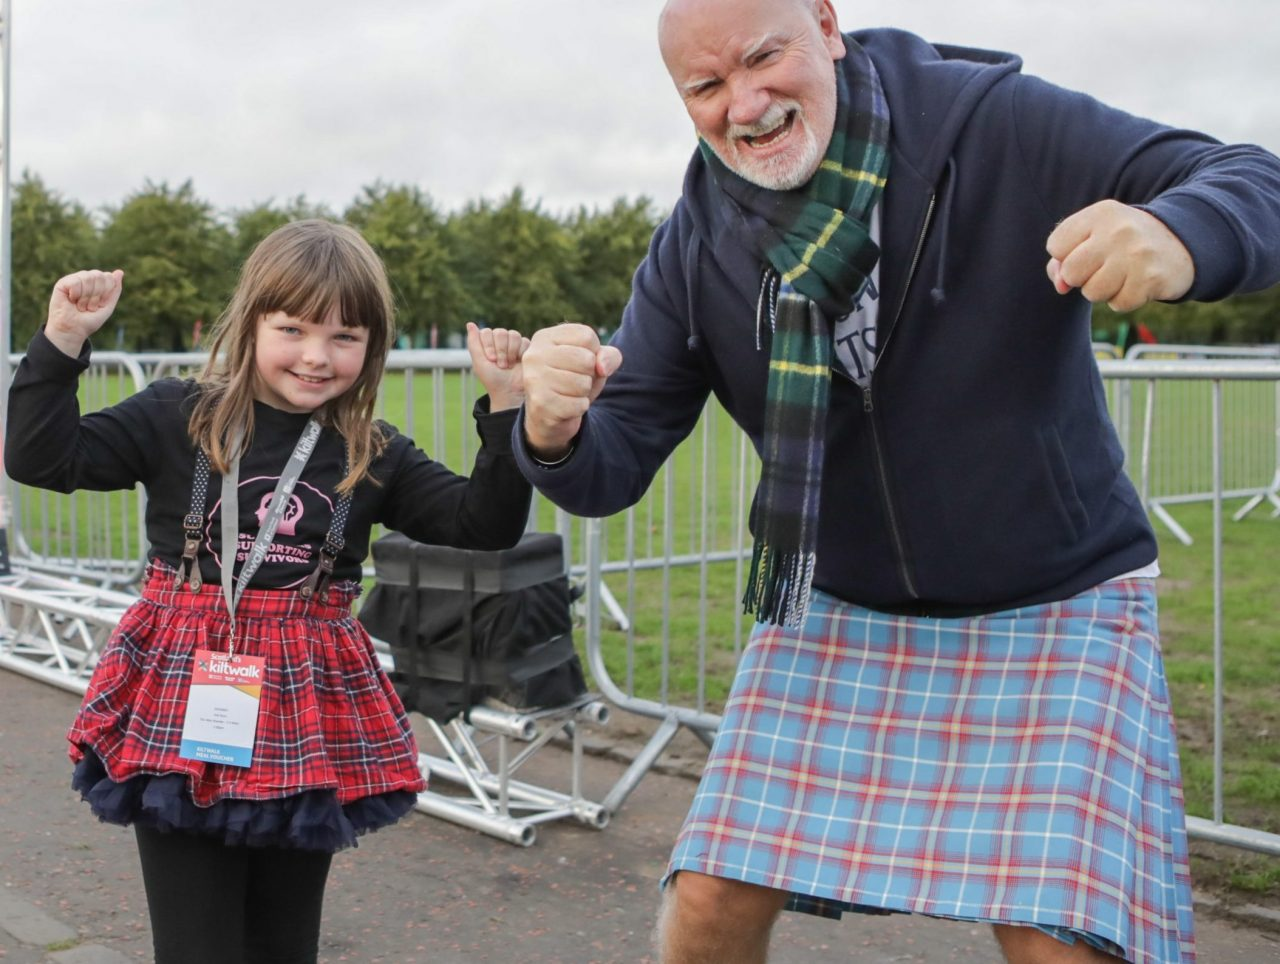 Kiltwalk raises a record £8.4m for charities in 2021